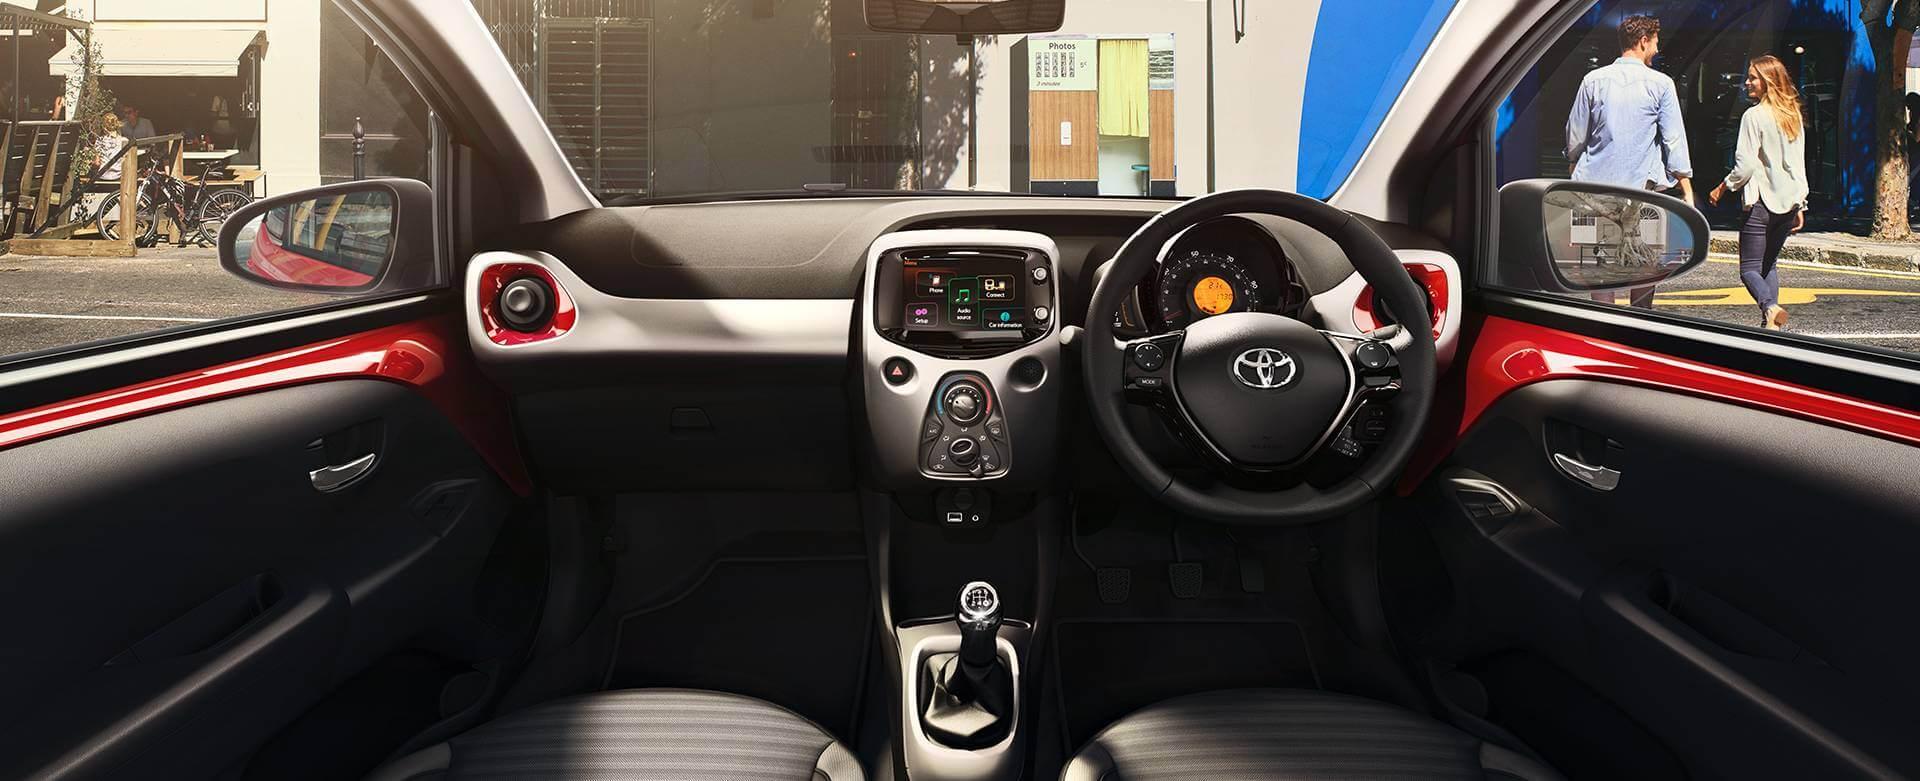 Toyota Aygo Interior Special Offer